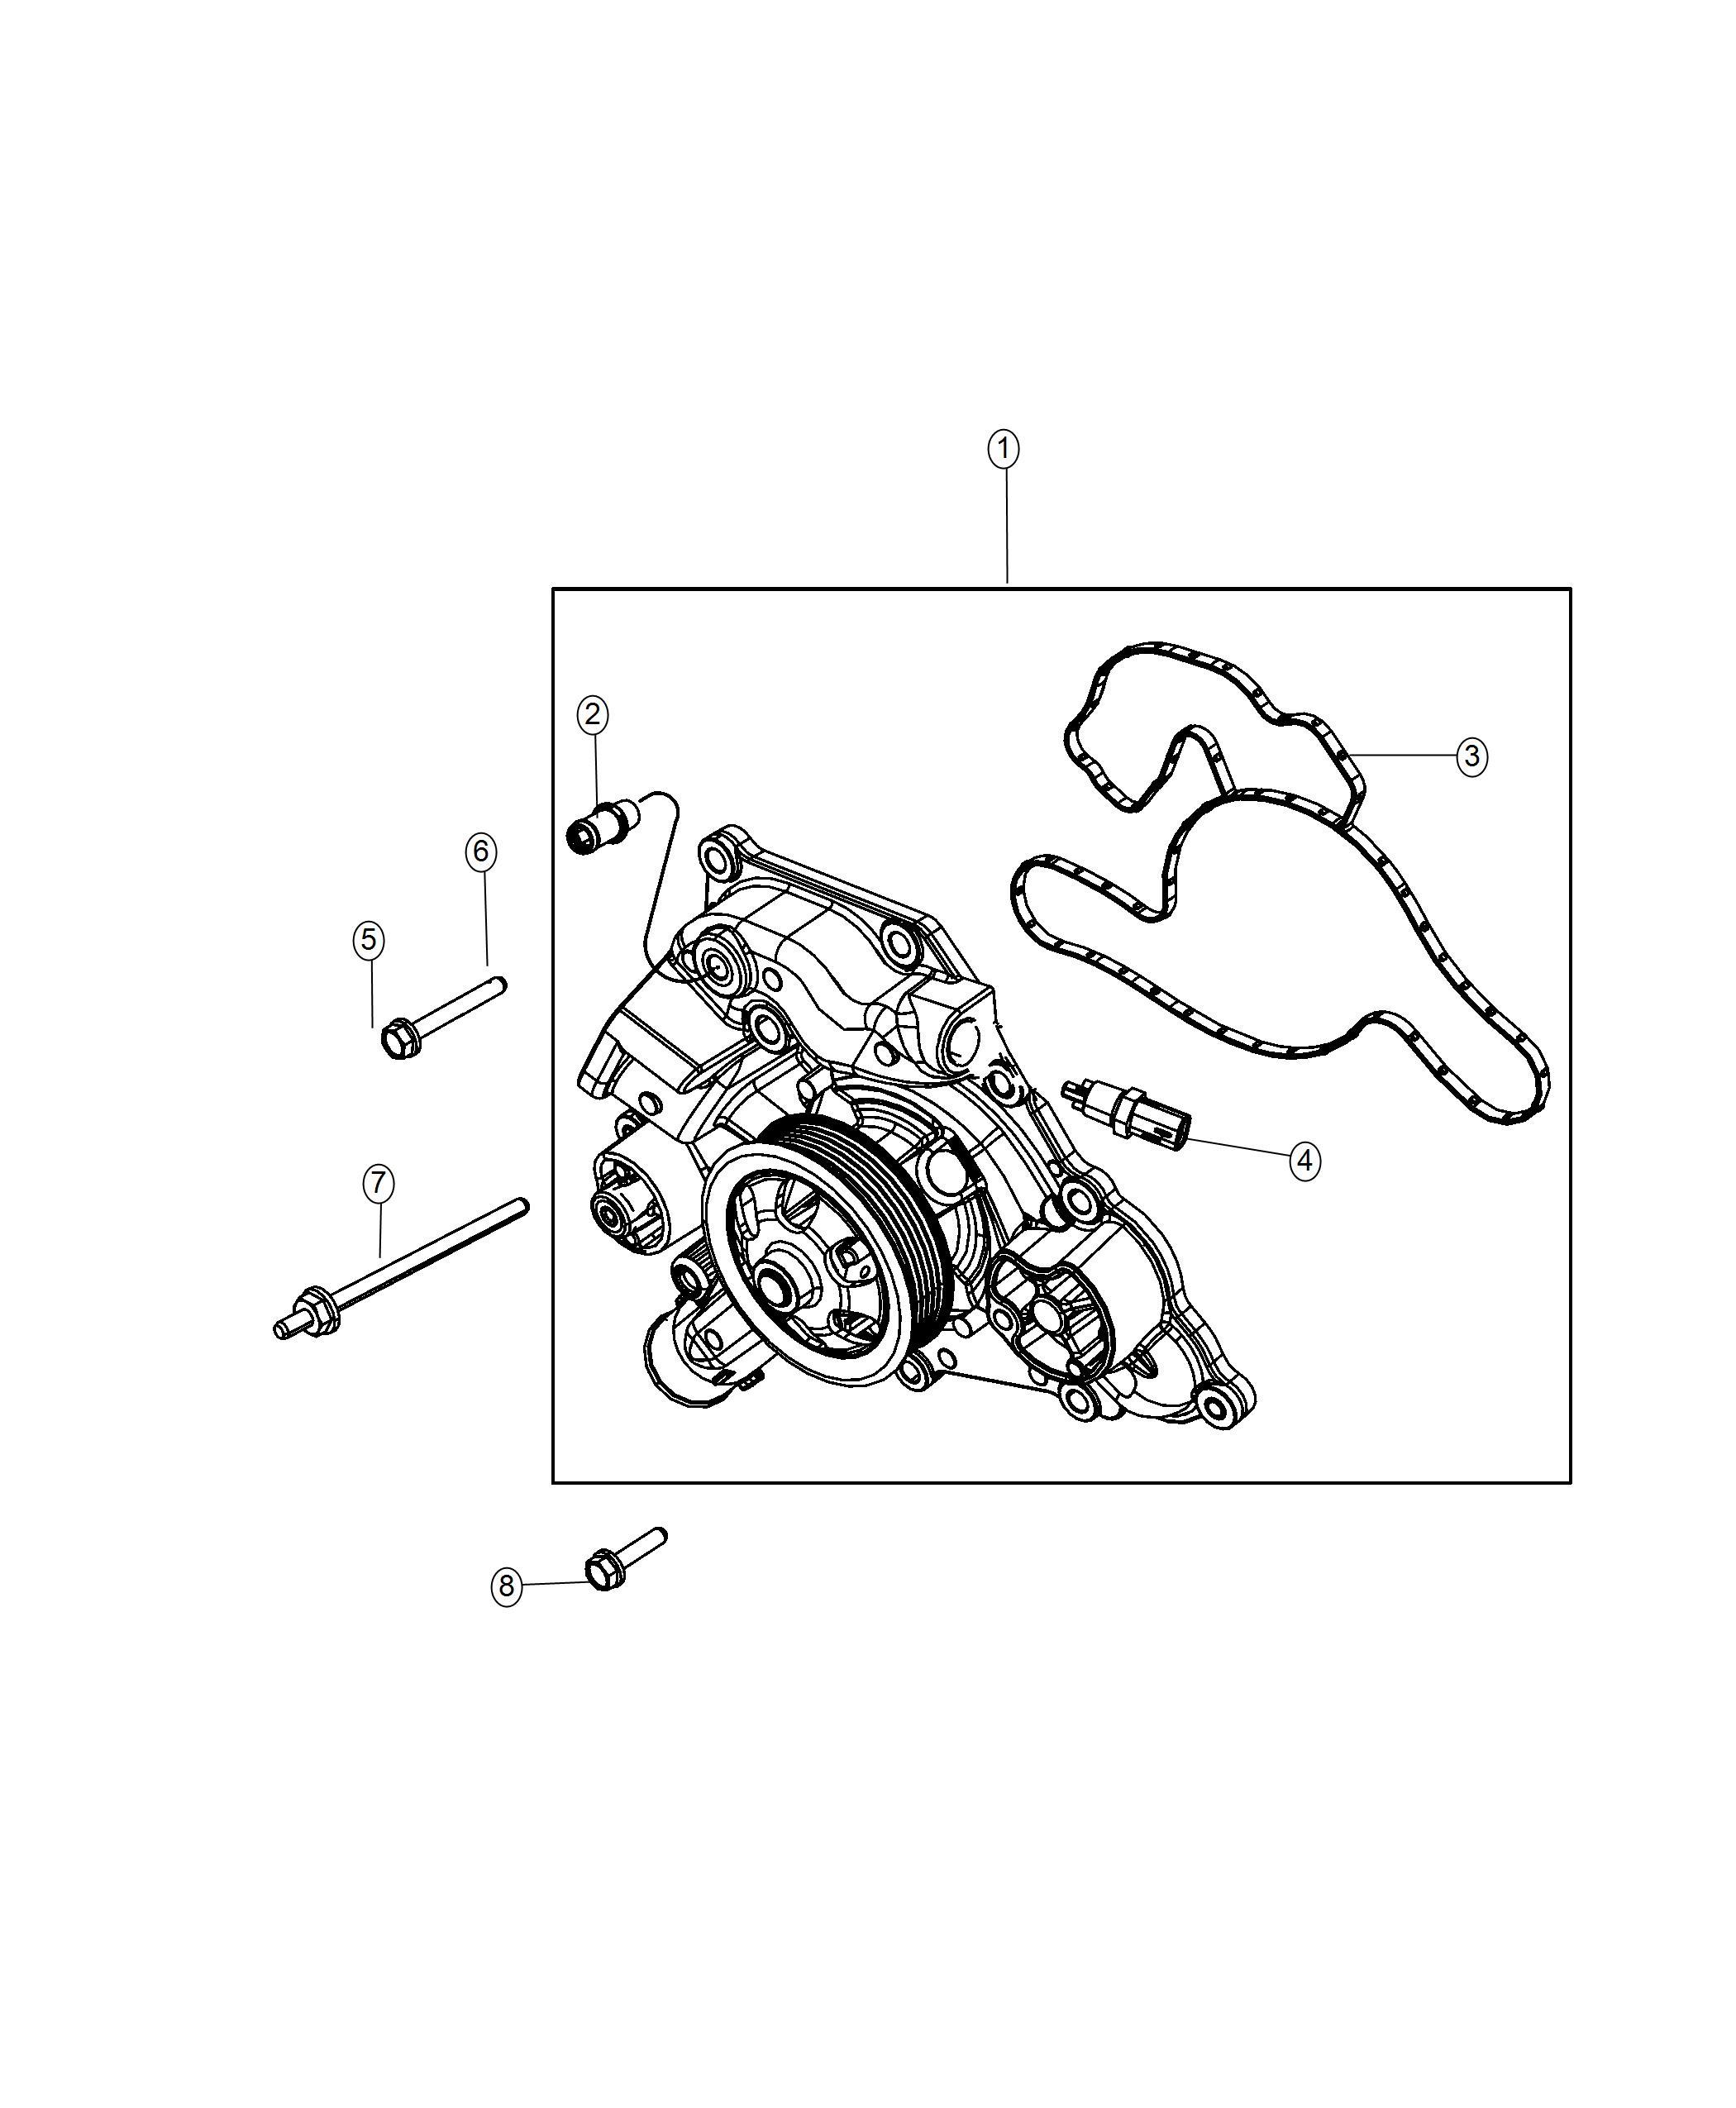 jeep grand cherokee gasket  water pump  engine  kits